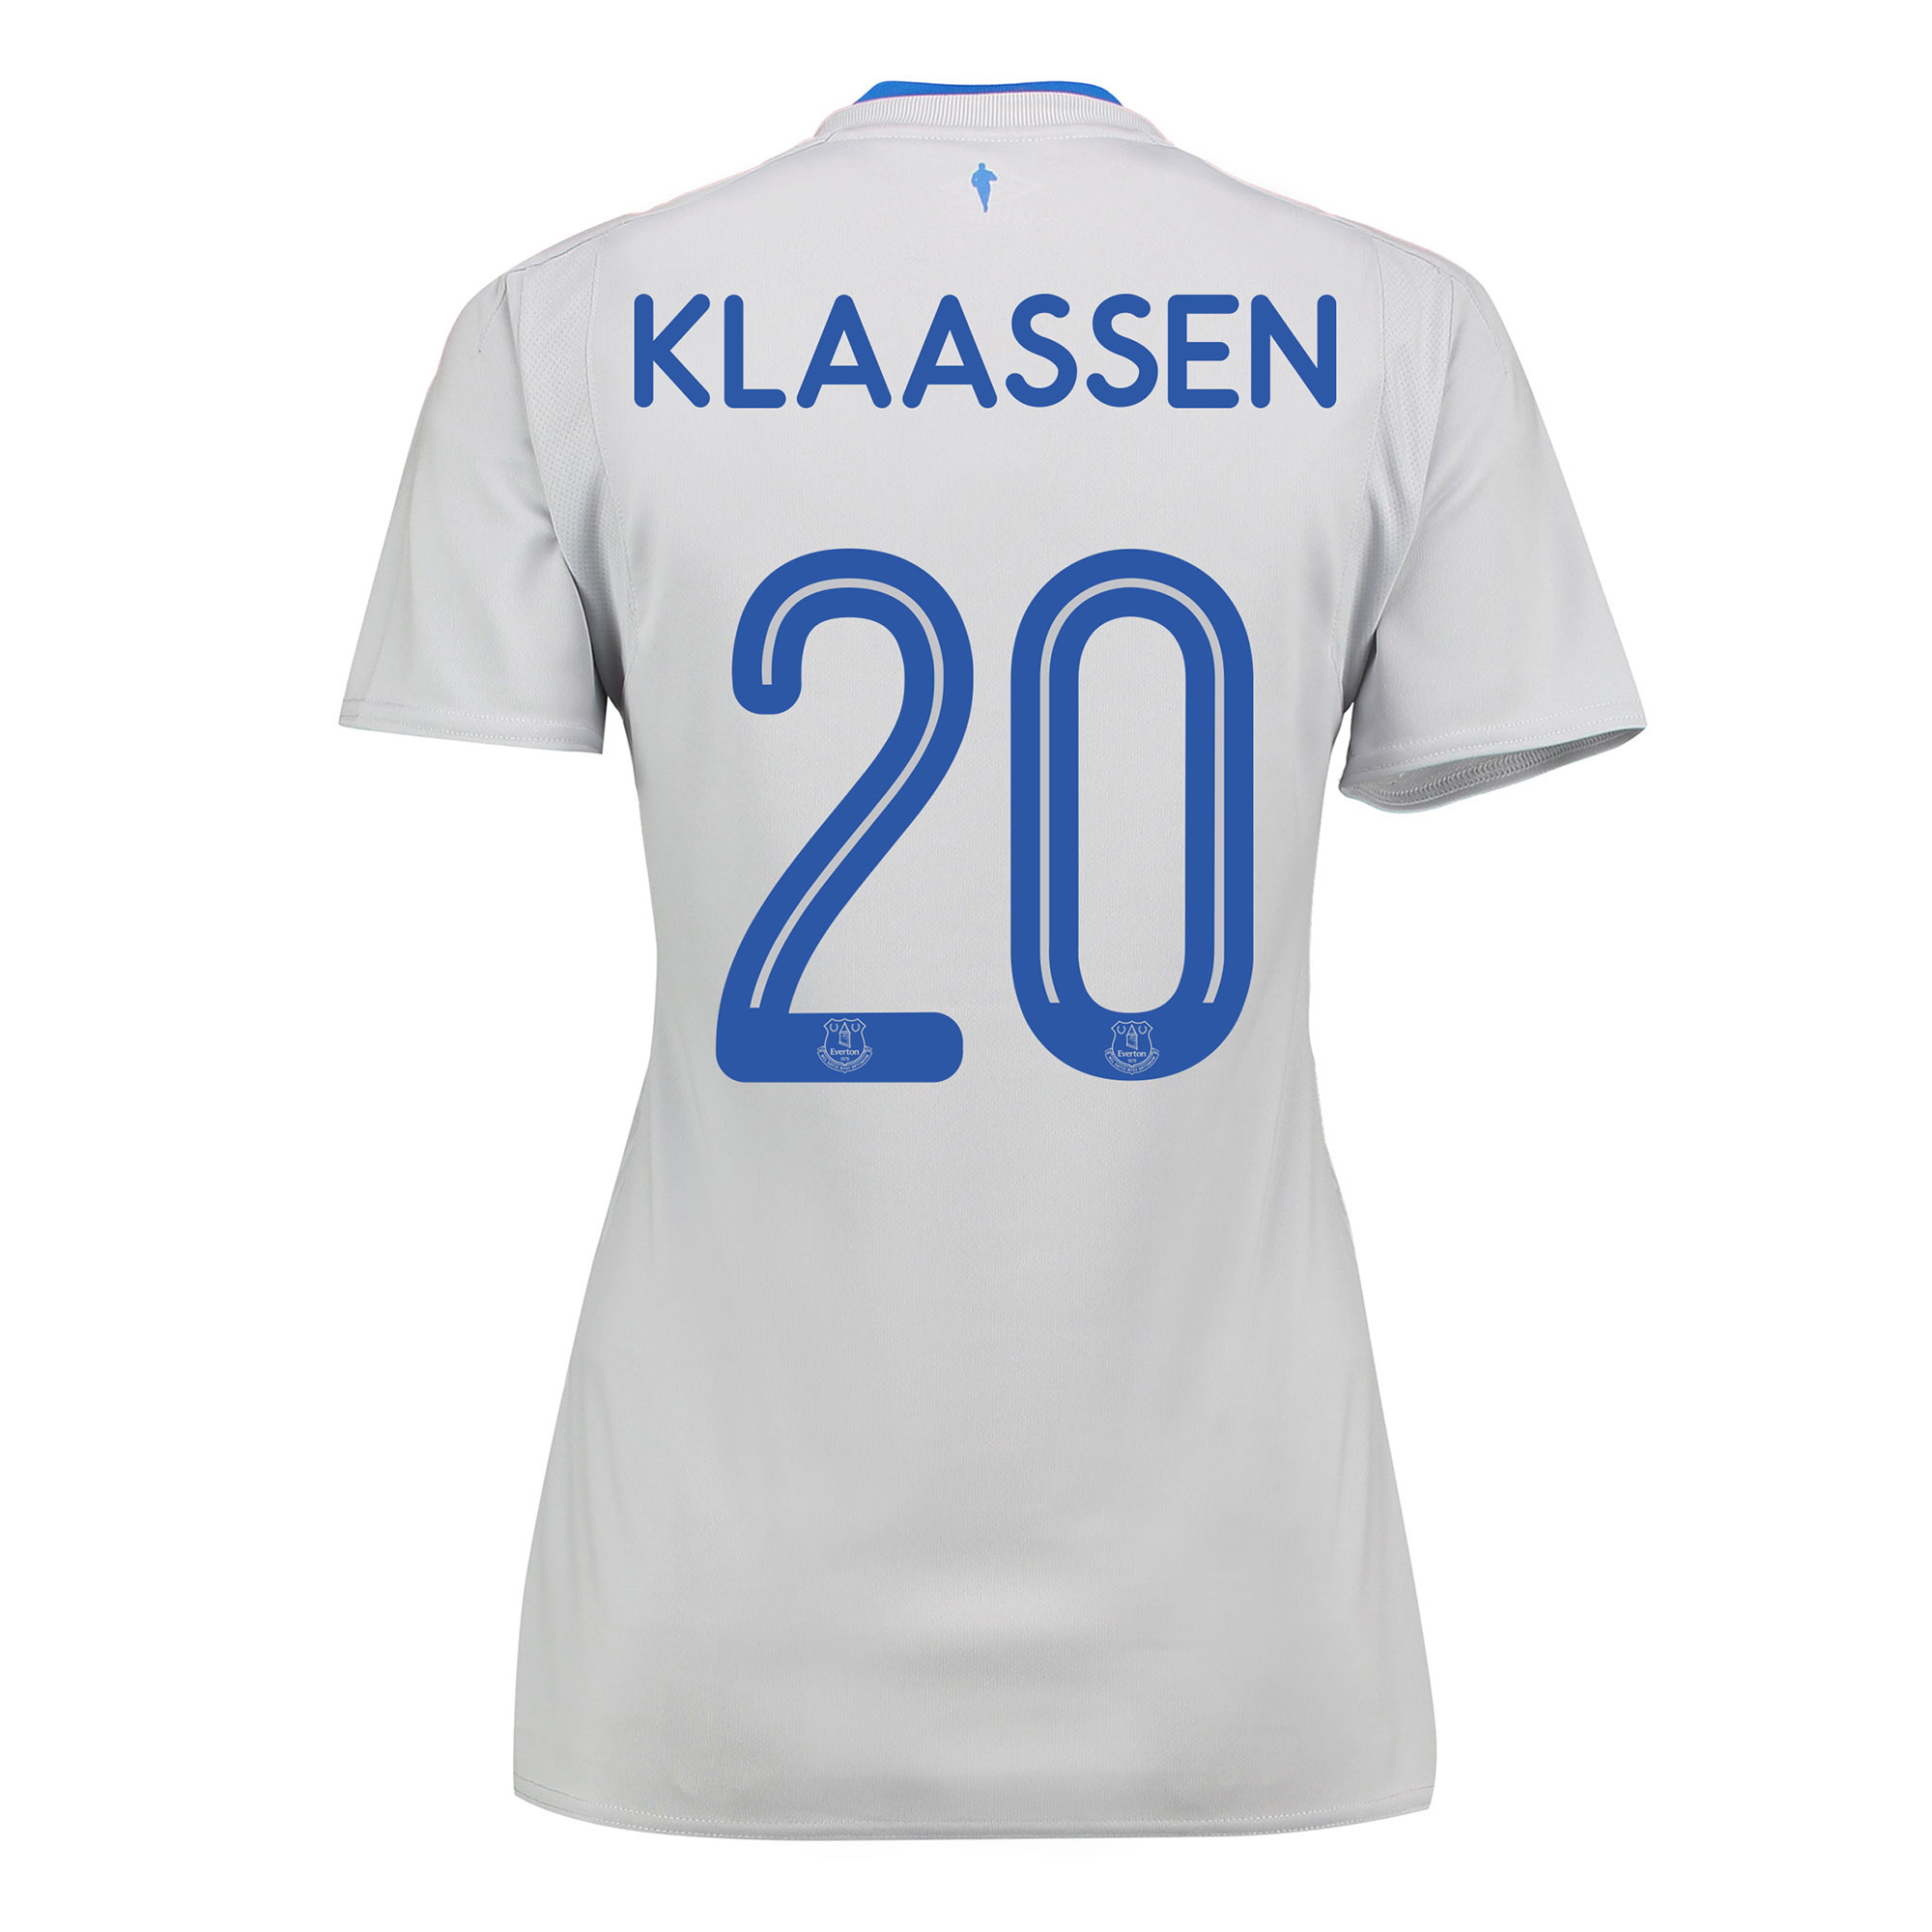 Everton Away Shirt 2017/18 - Womens with Klaassen 20 printing